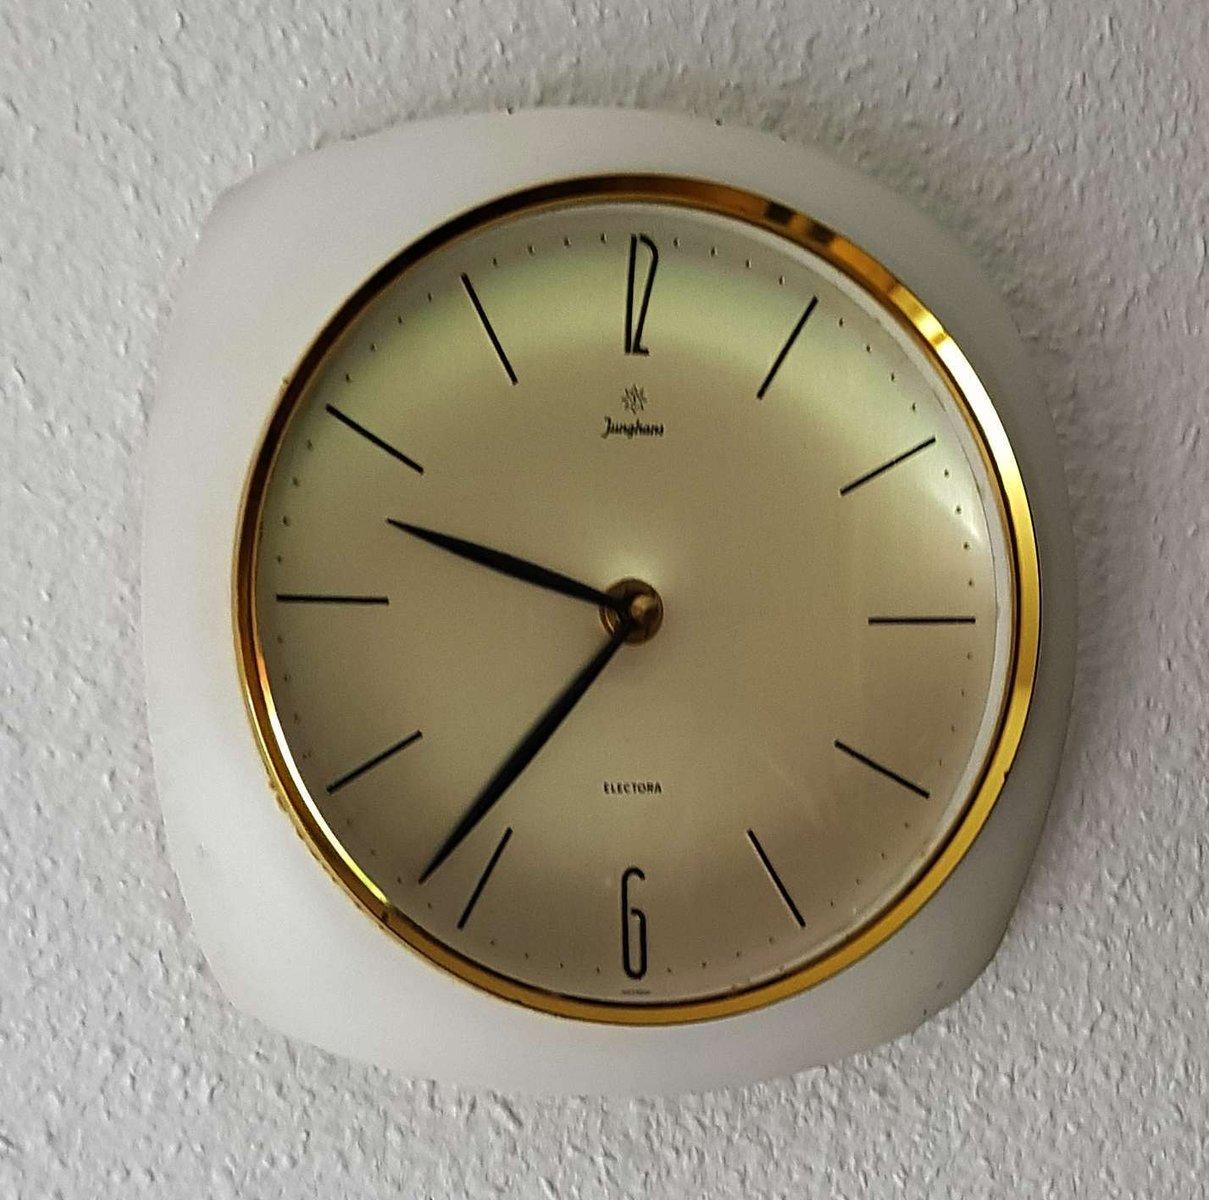 horloge murale vintage blanche et en laiton de junghans en. Black Bedroom Furniture Sets. Home Design Ideas